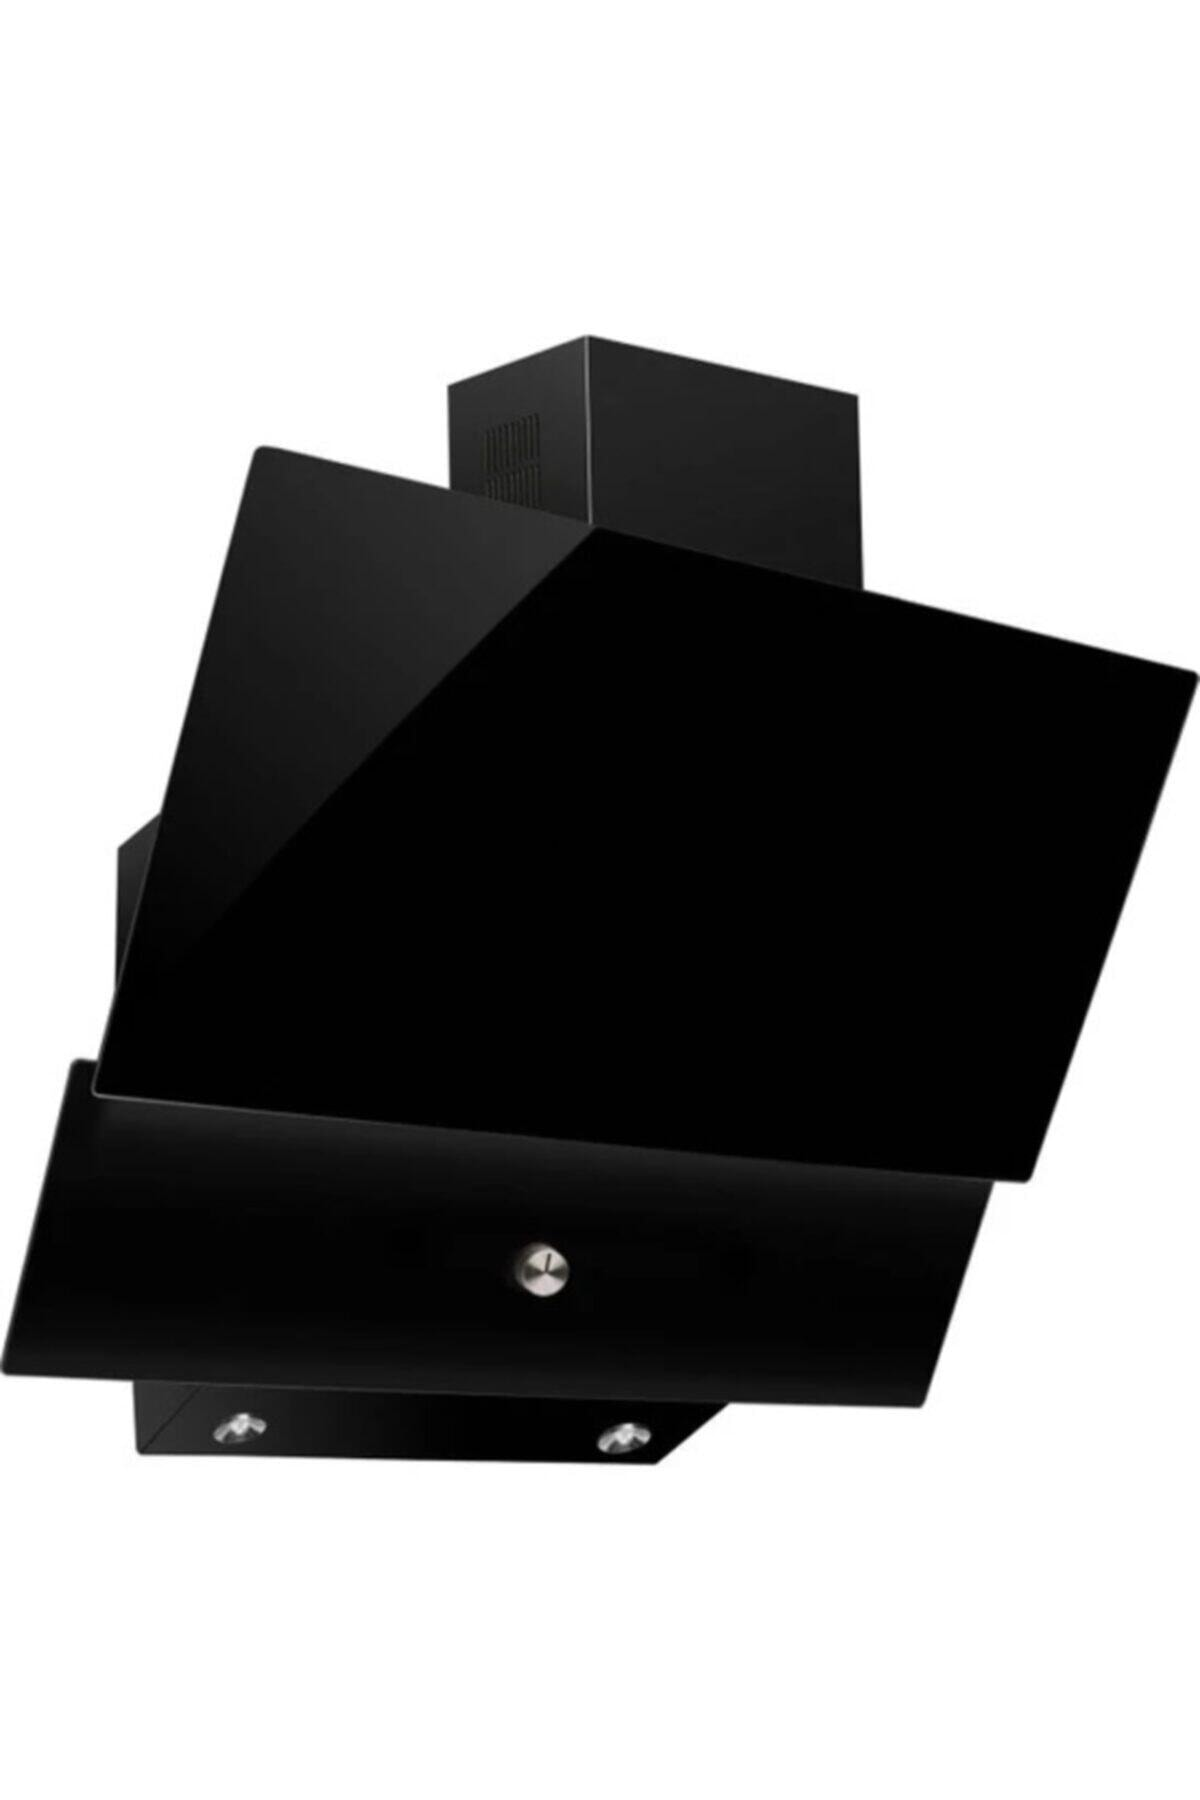 KUMTEL Da6-831 Siyah Cam Davlumbaz 1